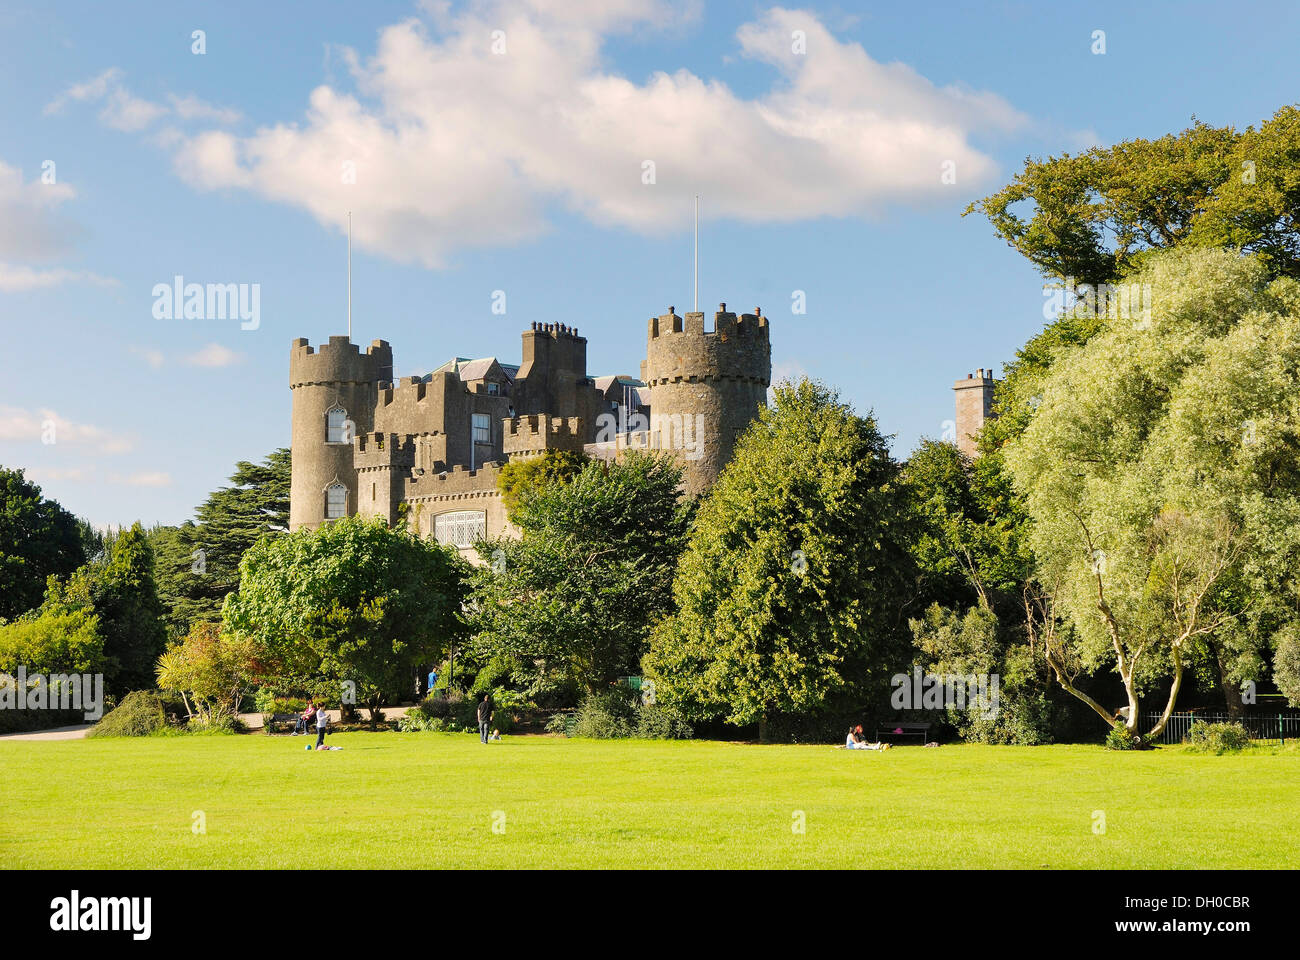 Palace gardens of Malahide Castle in Malahide, County Fingal, Republik of Ireland, Europe - Stock Image